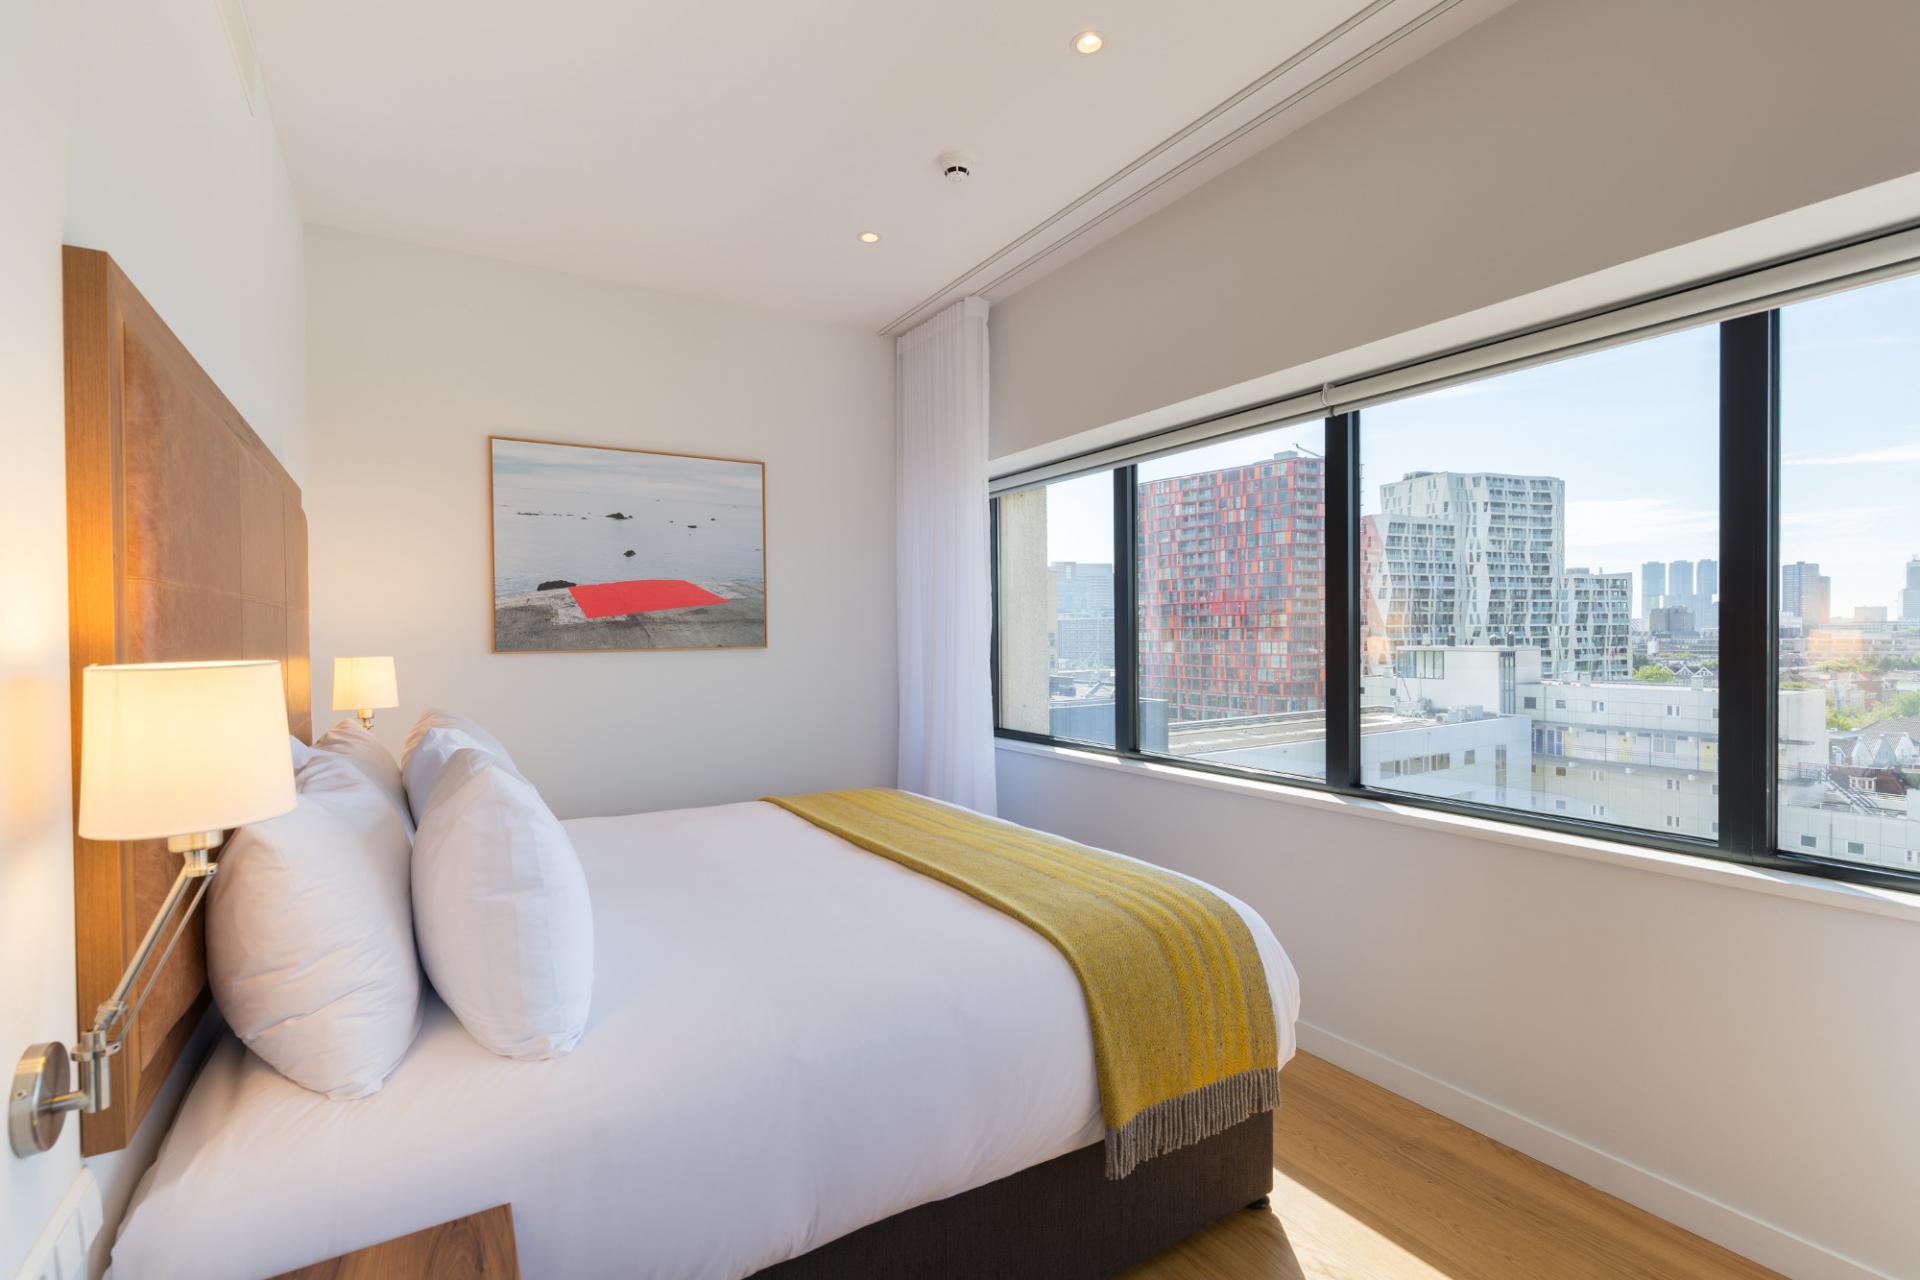 Bedroom at Premier Suites Plus Rotterdam - Citybase Apartments